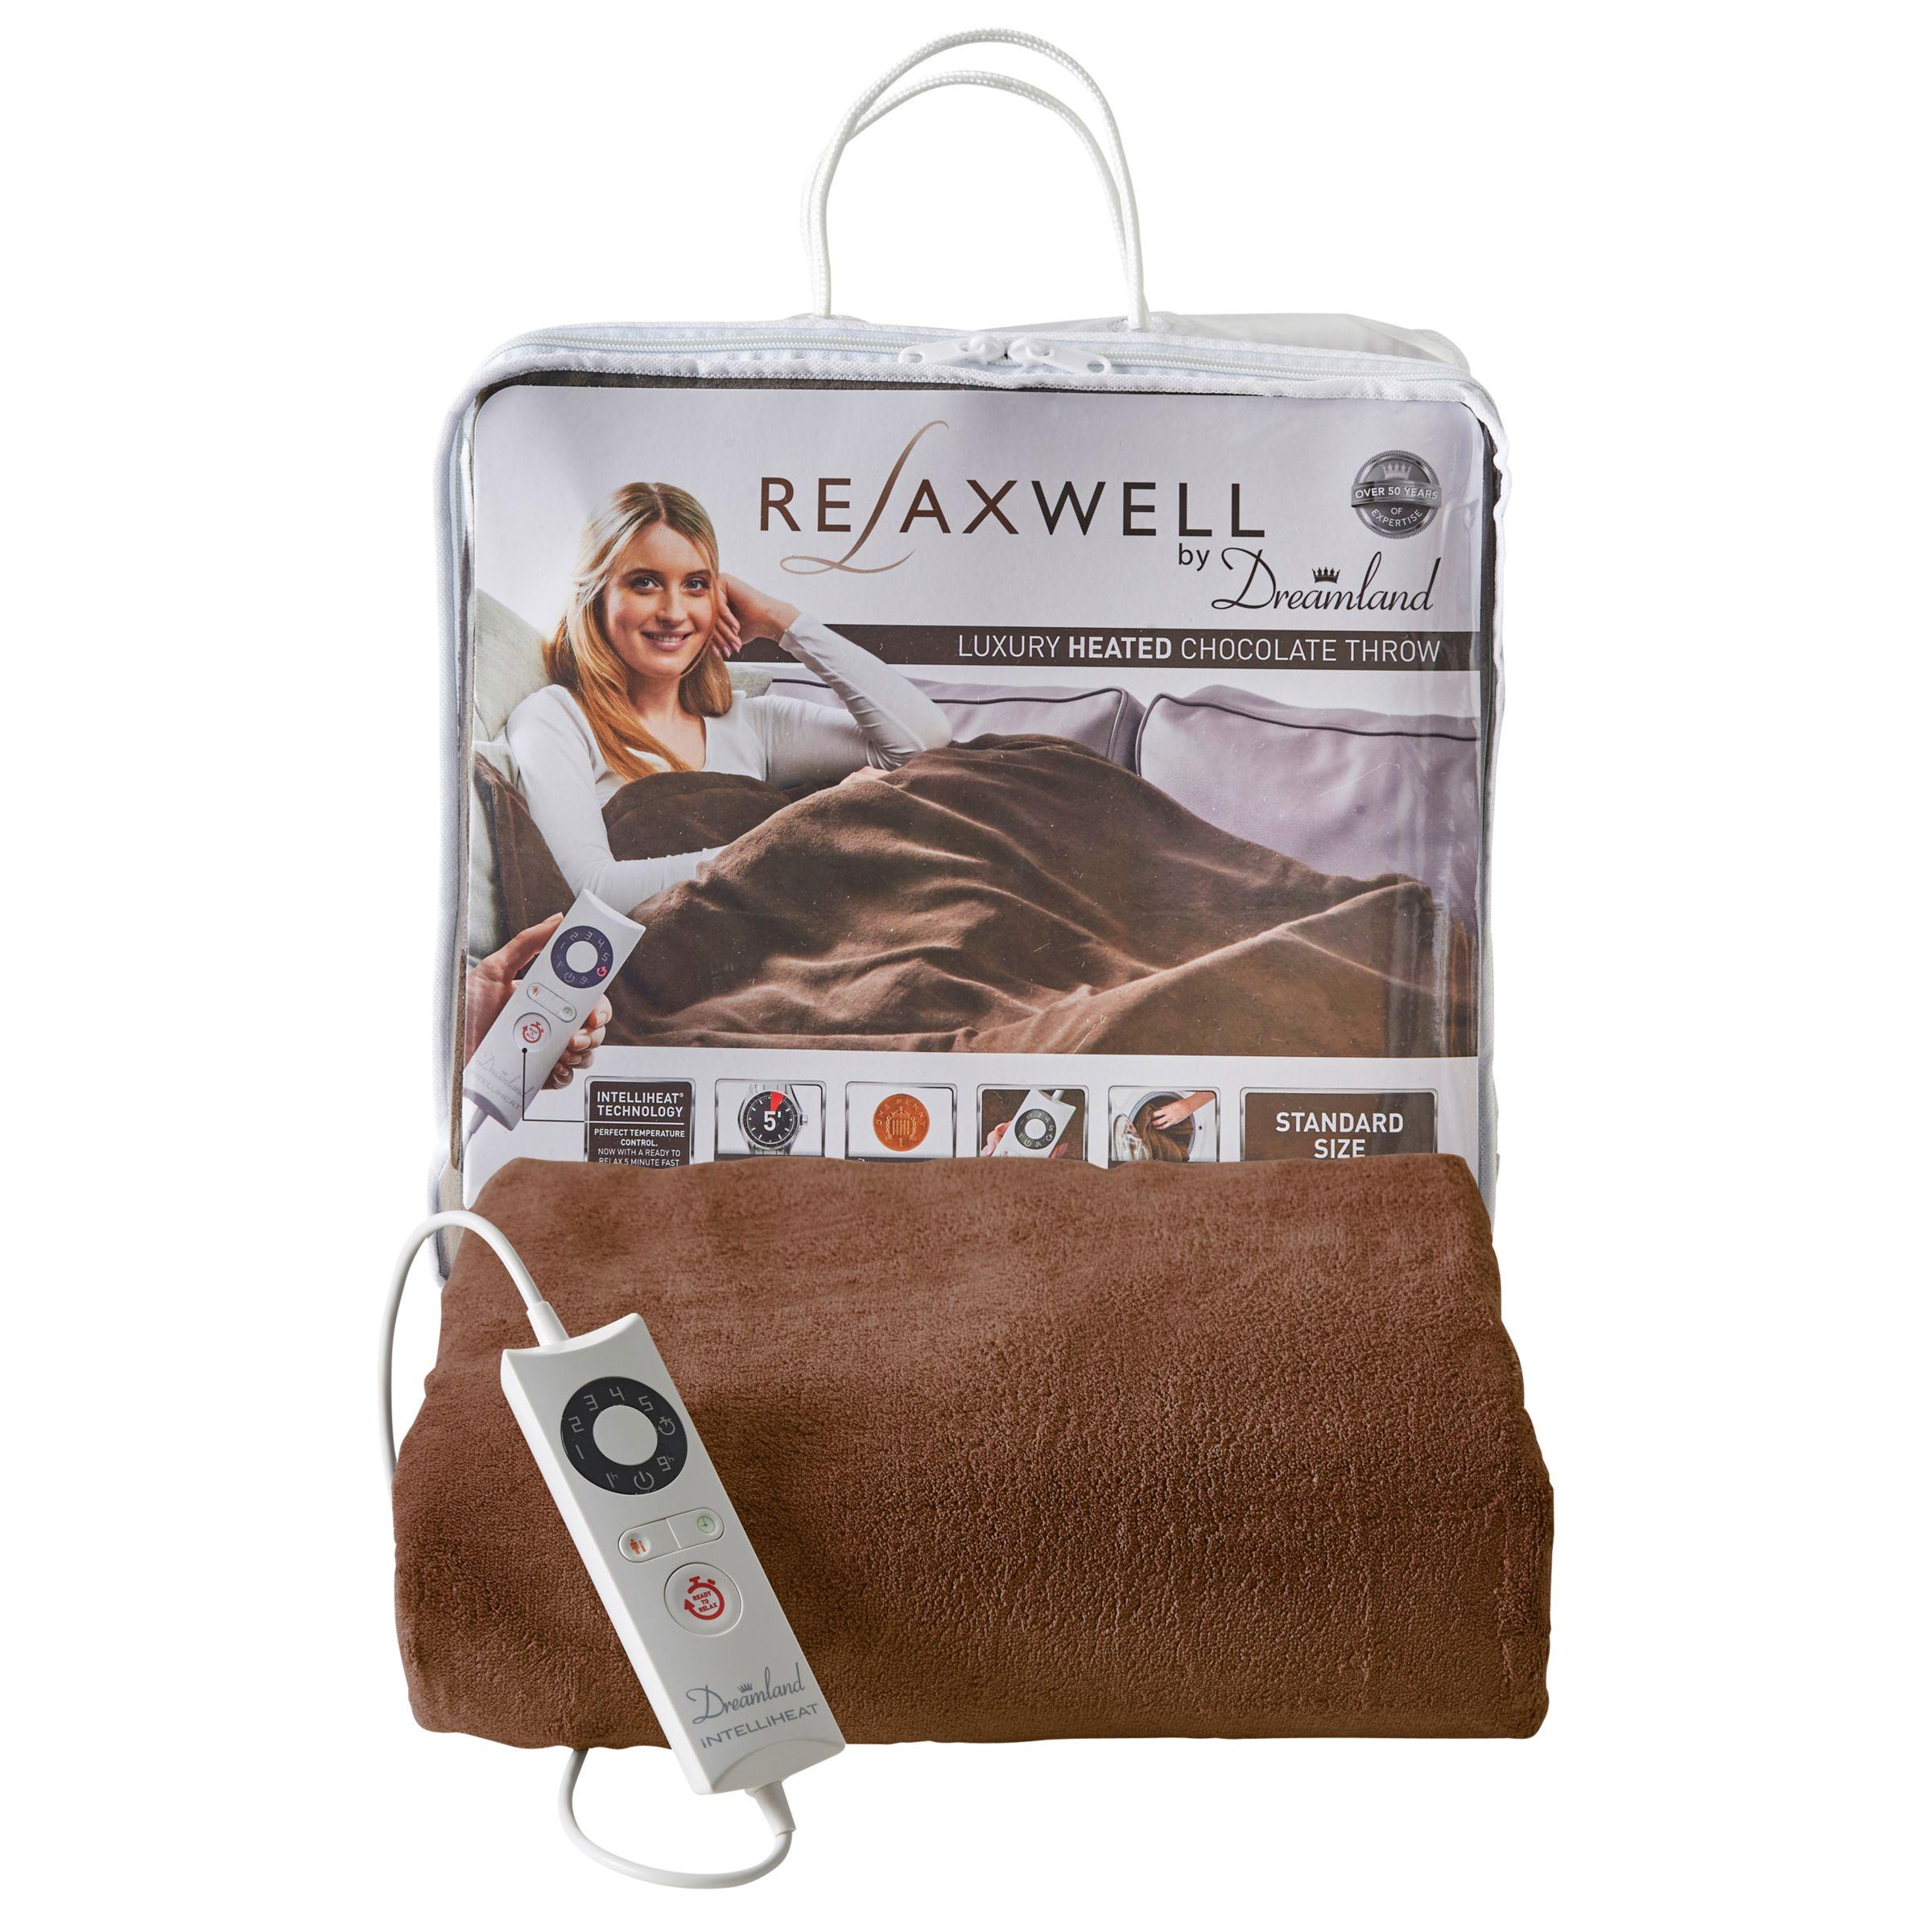 Dreamland Dreamland 16333 Relaxwell Luxury Heated Throw Electric Blanket, Chocolate Brown